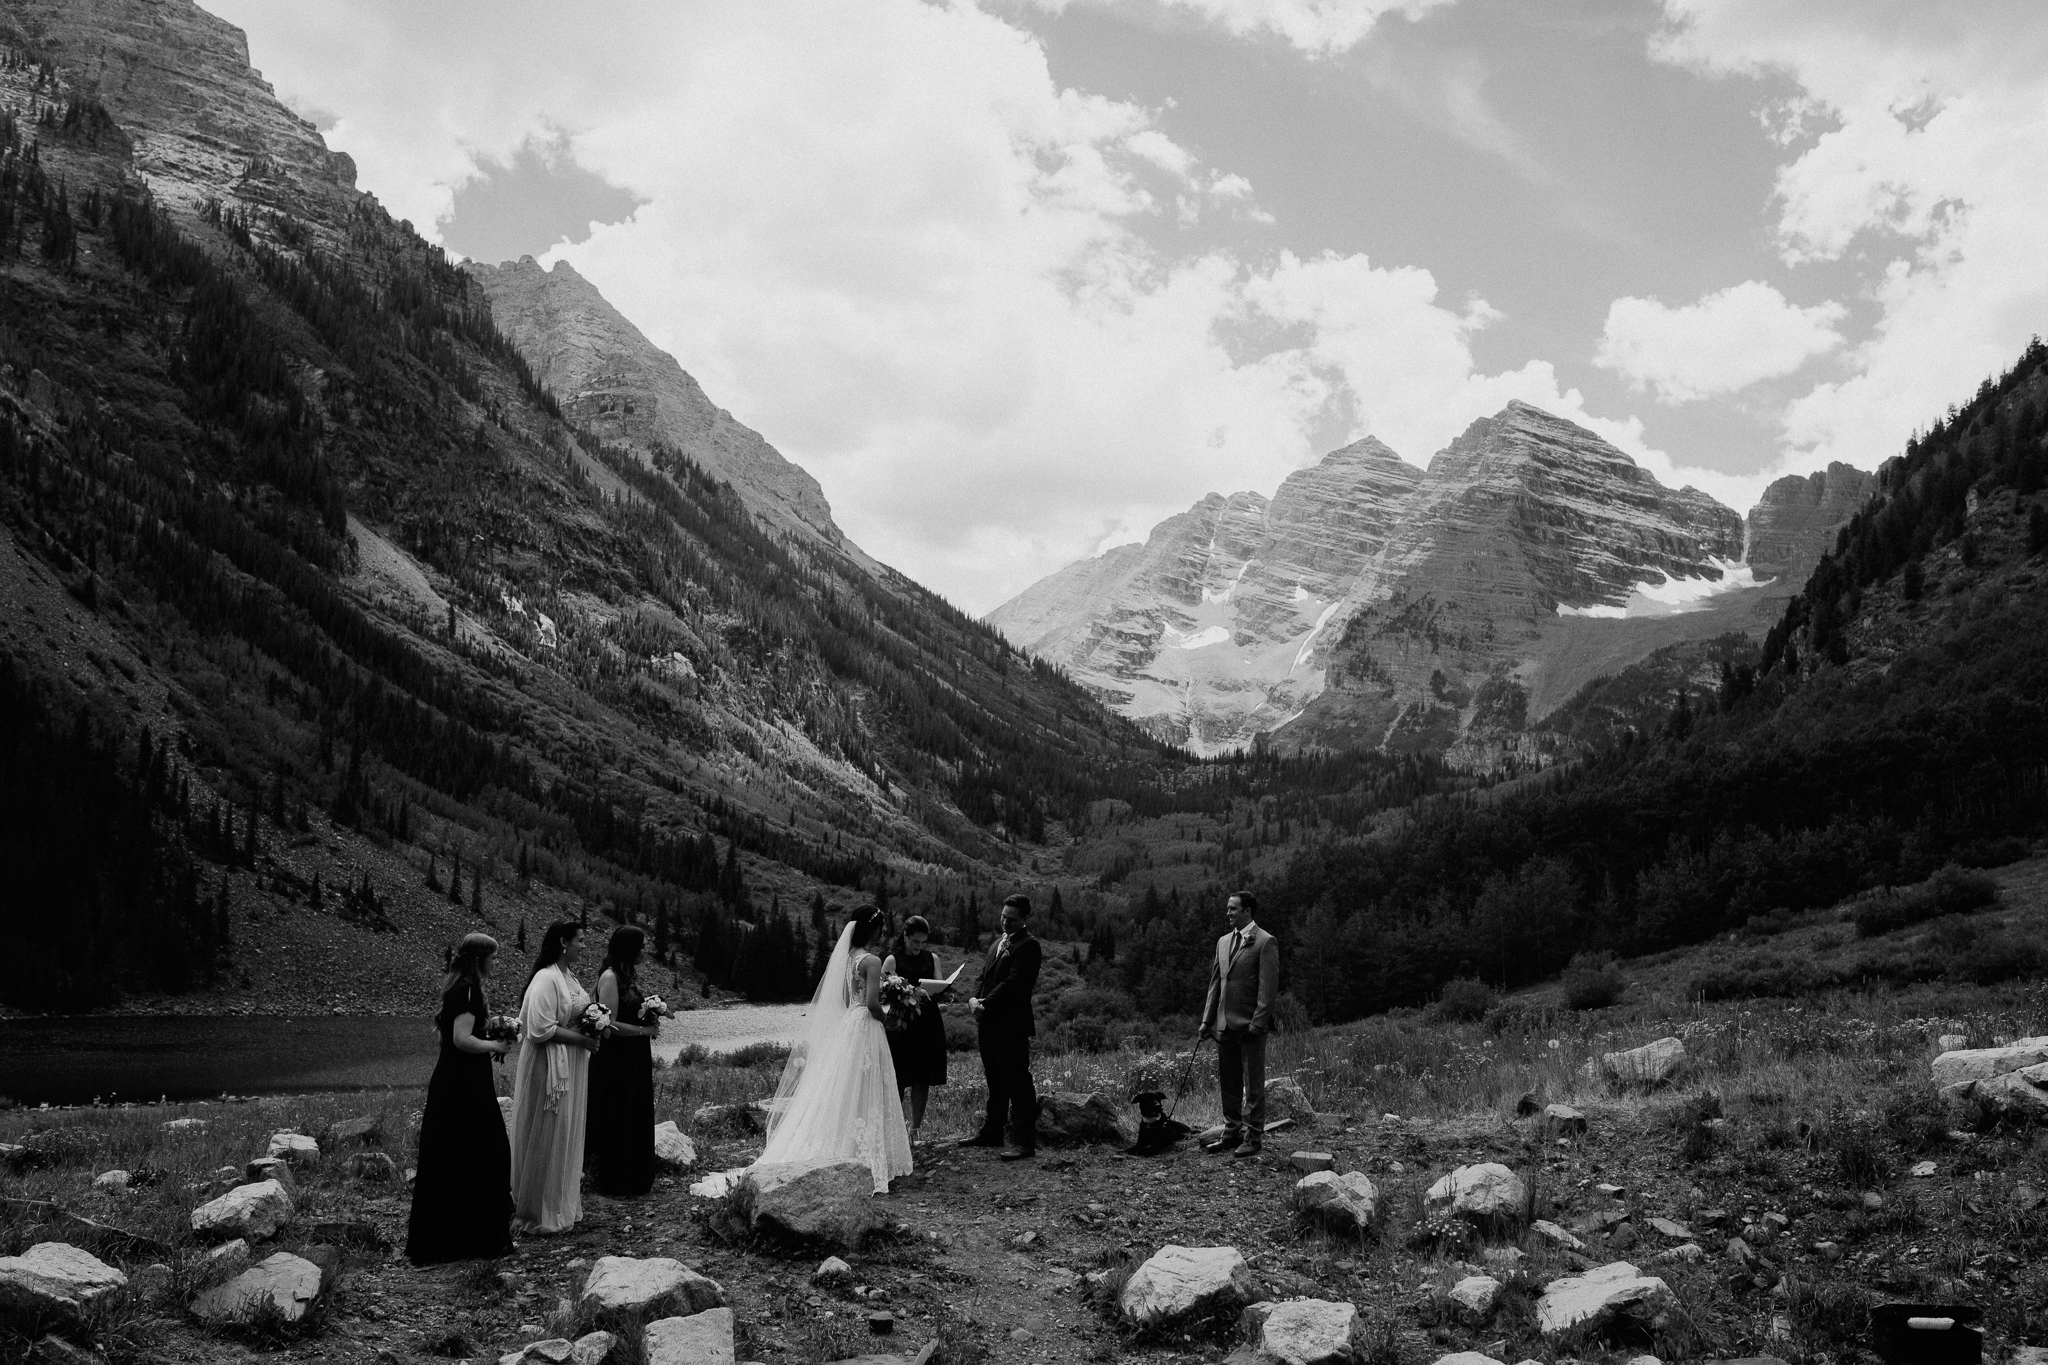 Maroon Bells intimate Elopement, Colorado wedding.